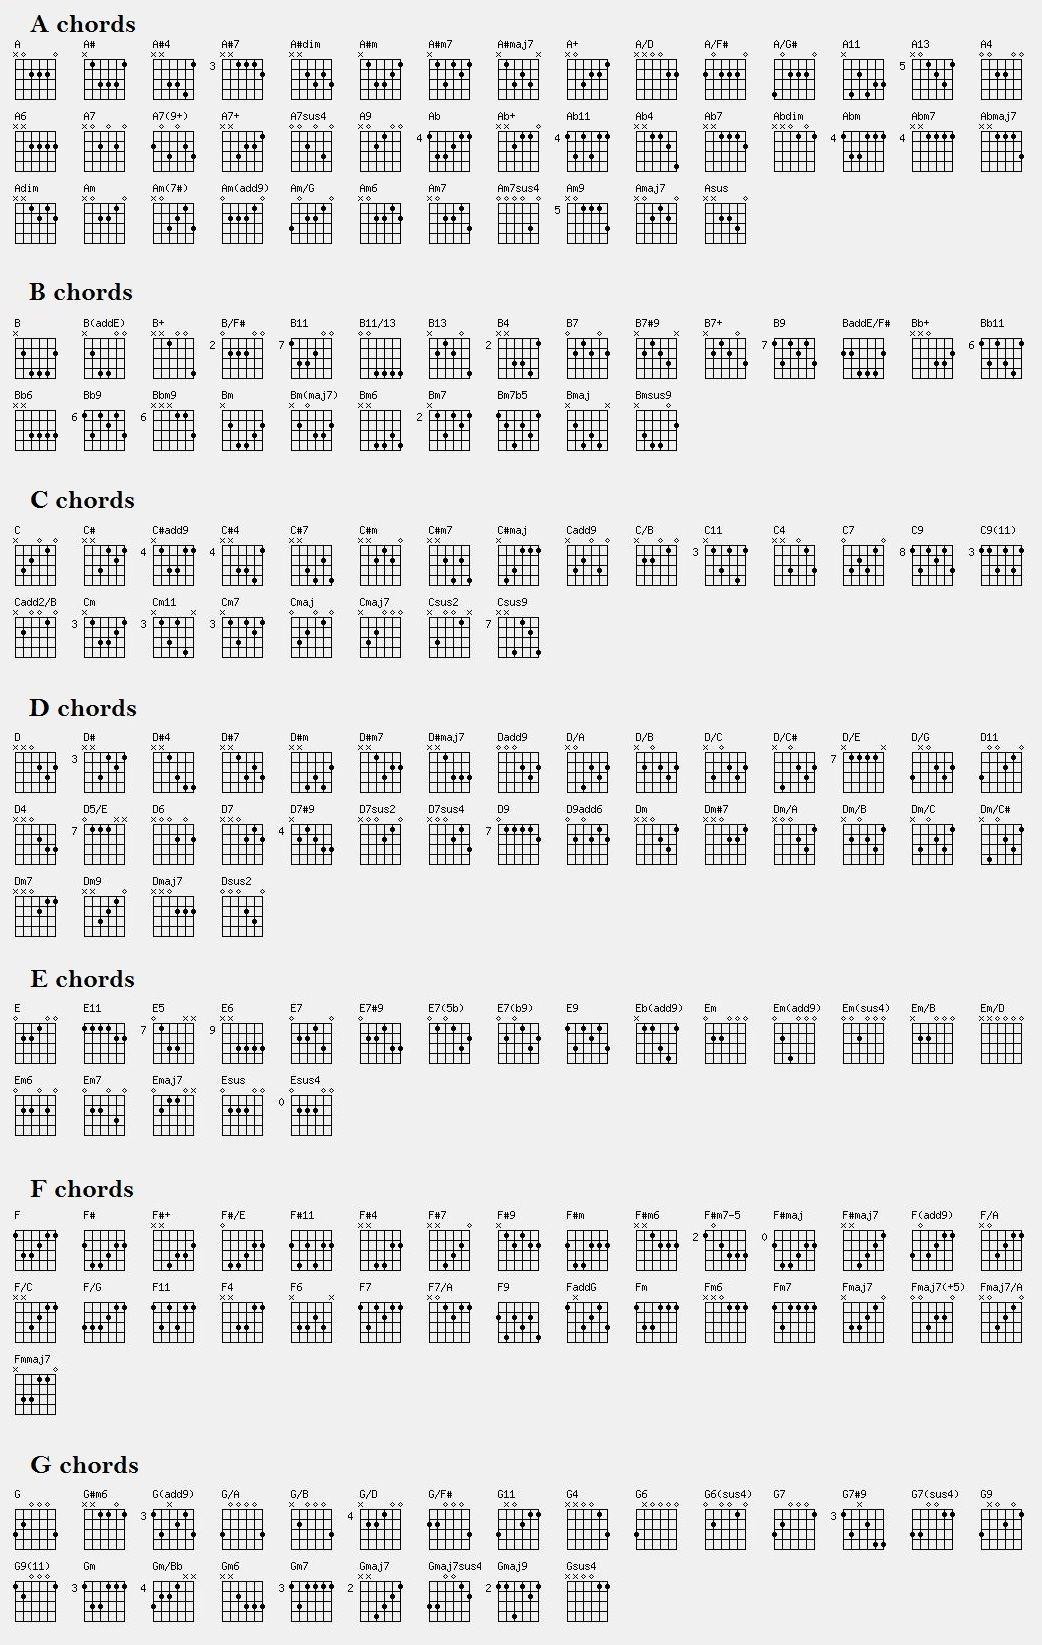 Free Printable Guitar Chord Chart | Guitar Chords Chart - Printable - Free Printable Bass Guitar Chord Chart